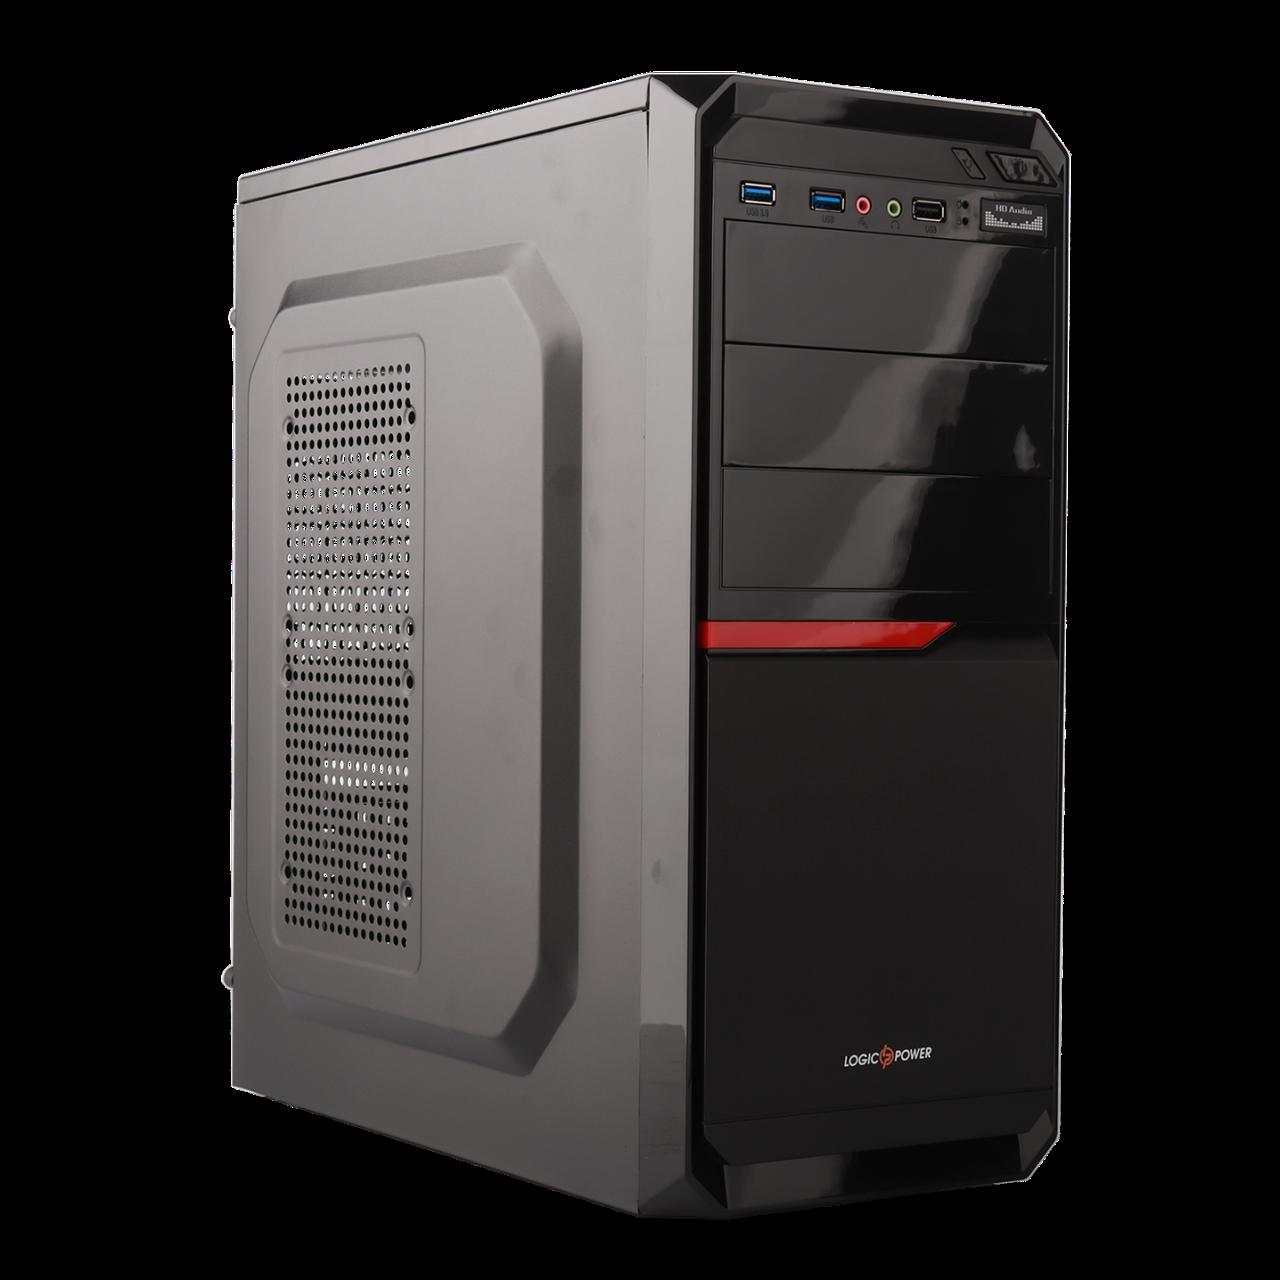 Корпус LP 2012-БЕЗ БП black case chassis cover с 2xUSB3.0+1xUSB2.0